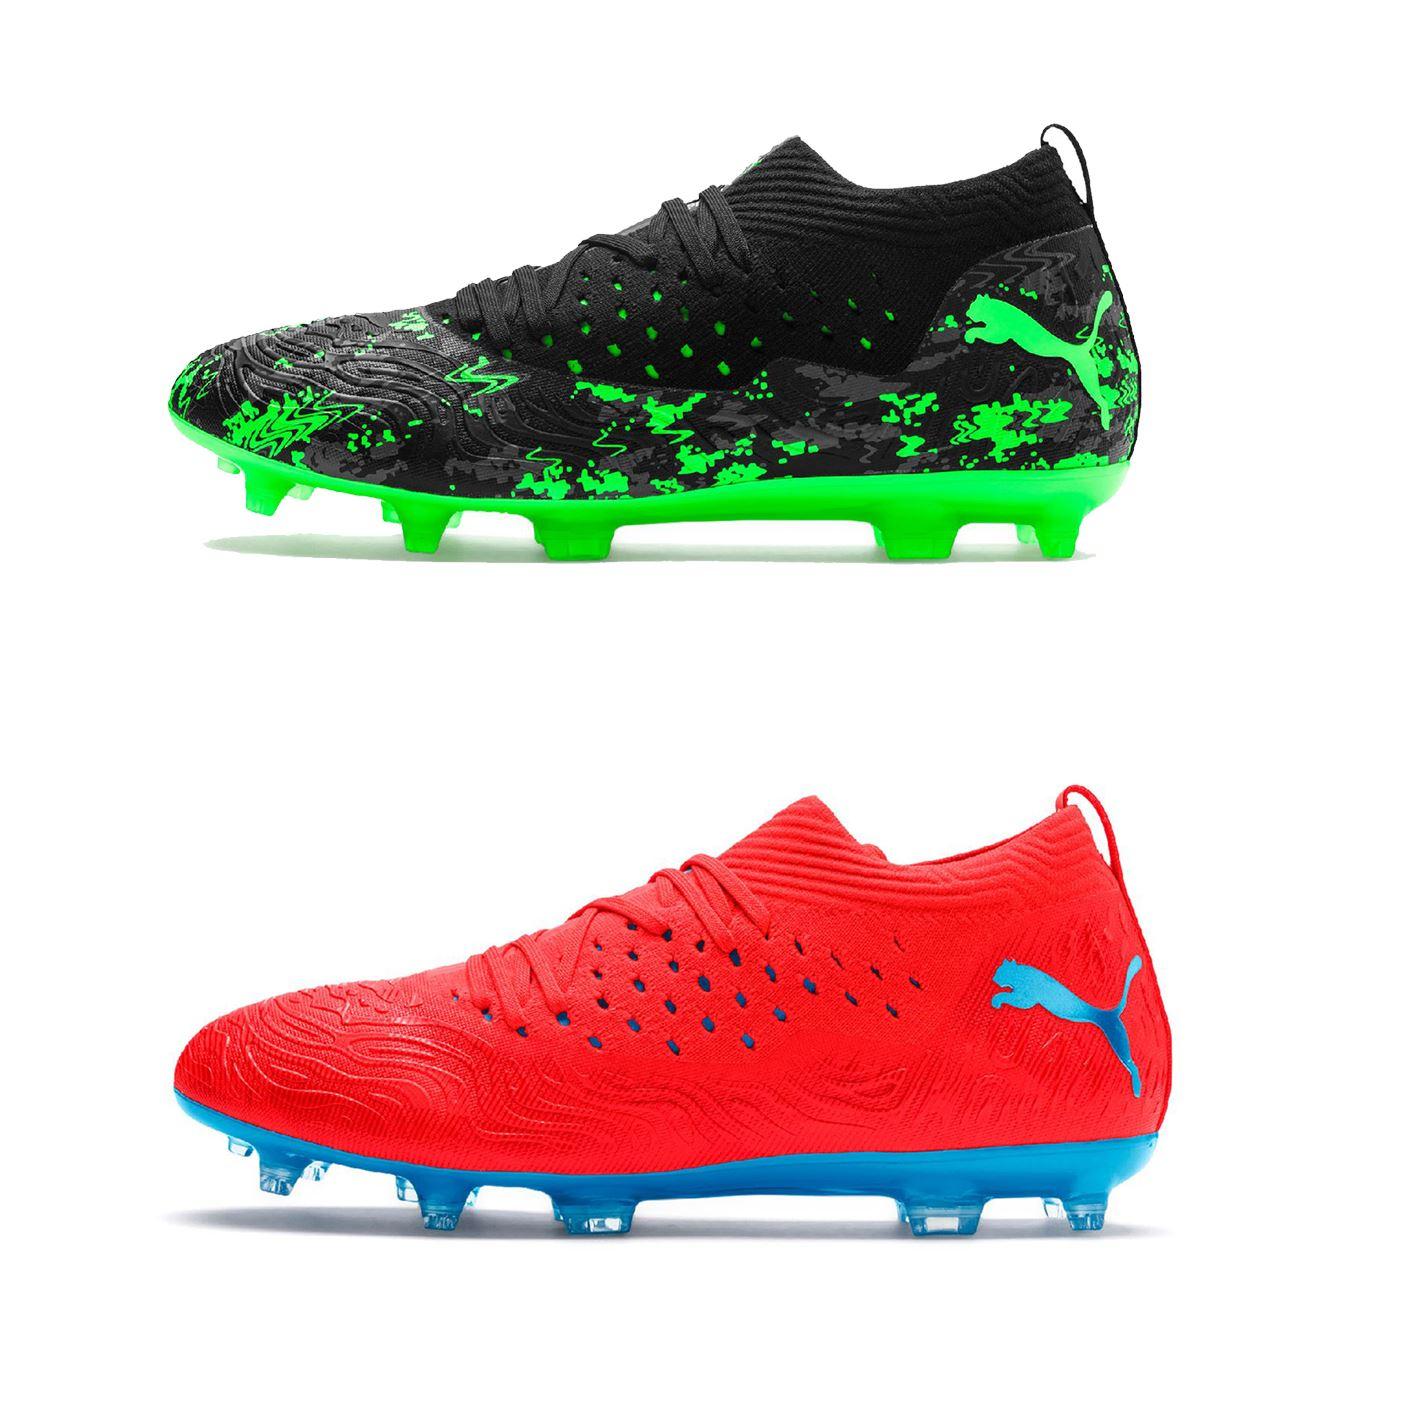 Details zu Puma Future 19.2 Firm Ground FG Football Boots Mens Soccer Cleats Shoes Footwear